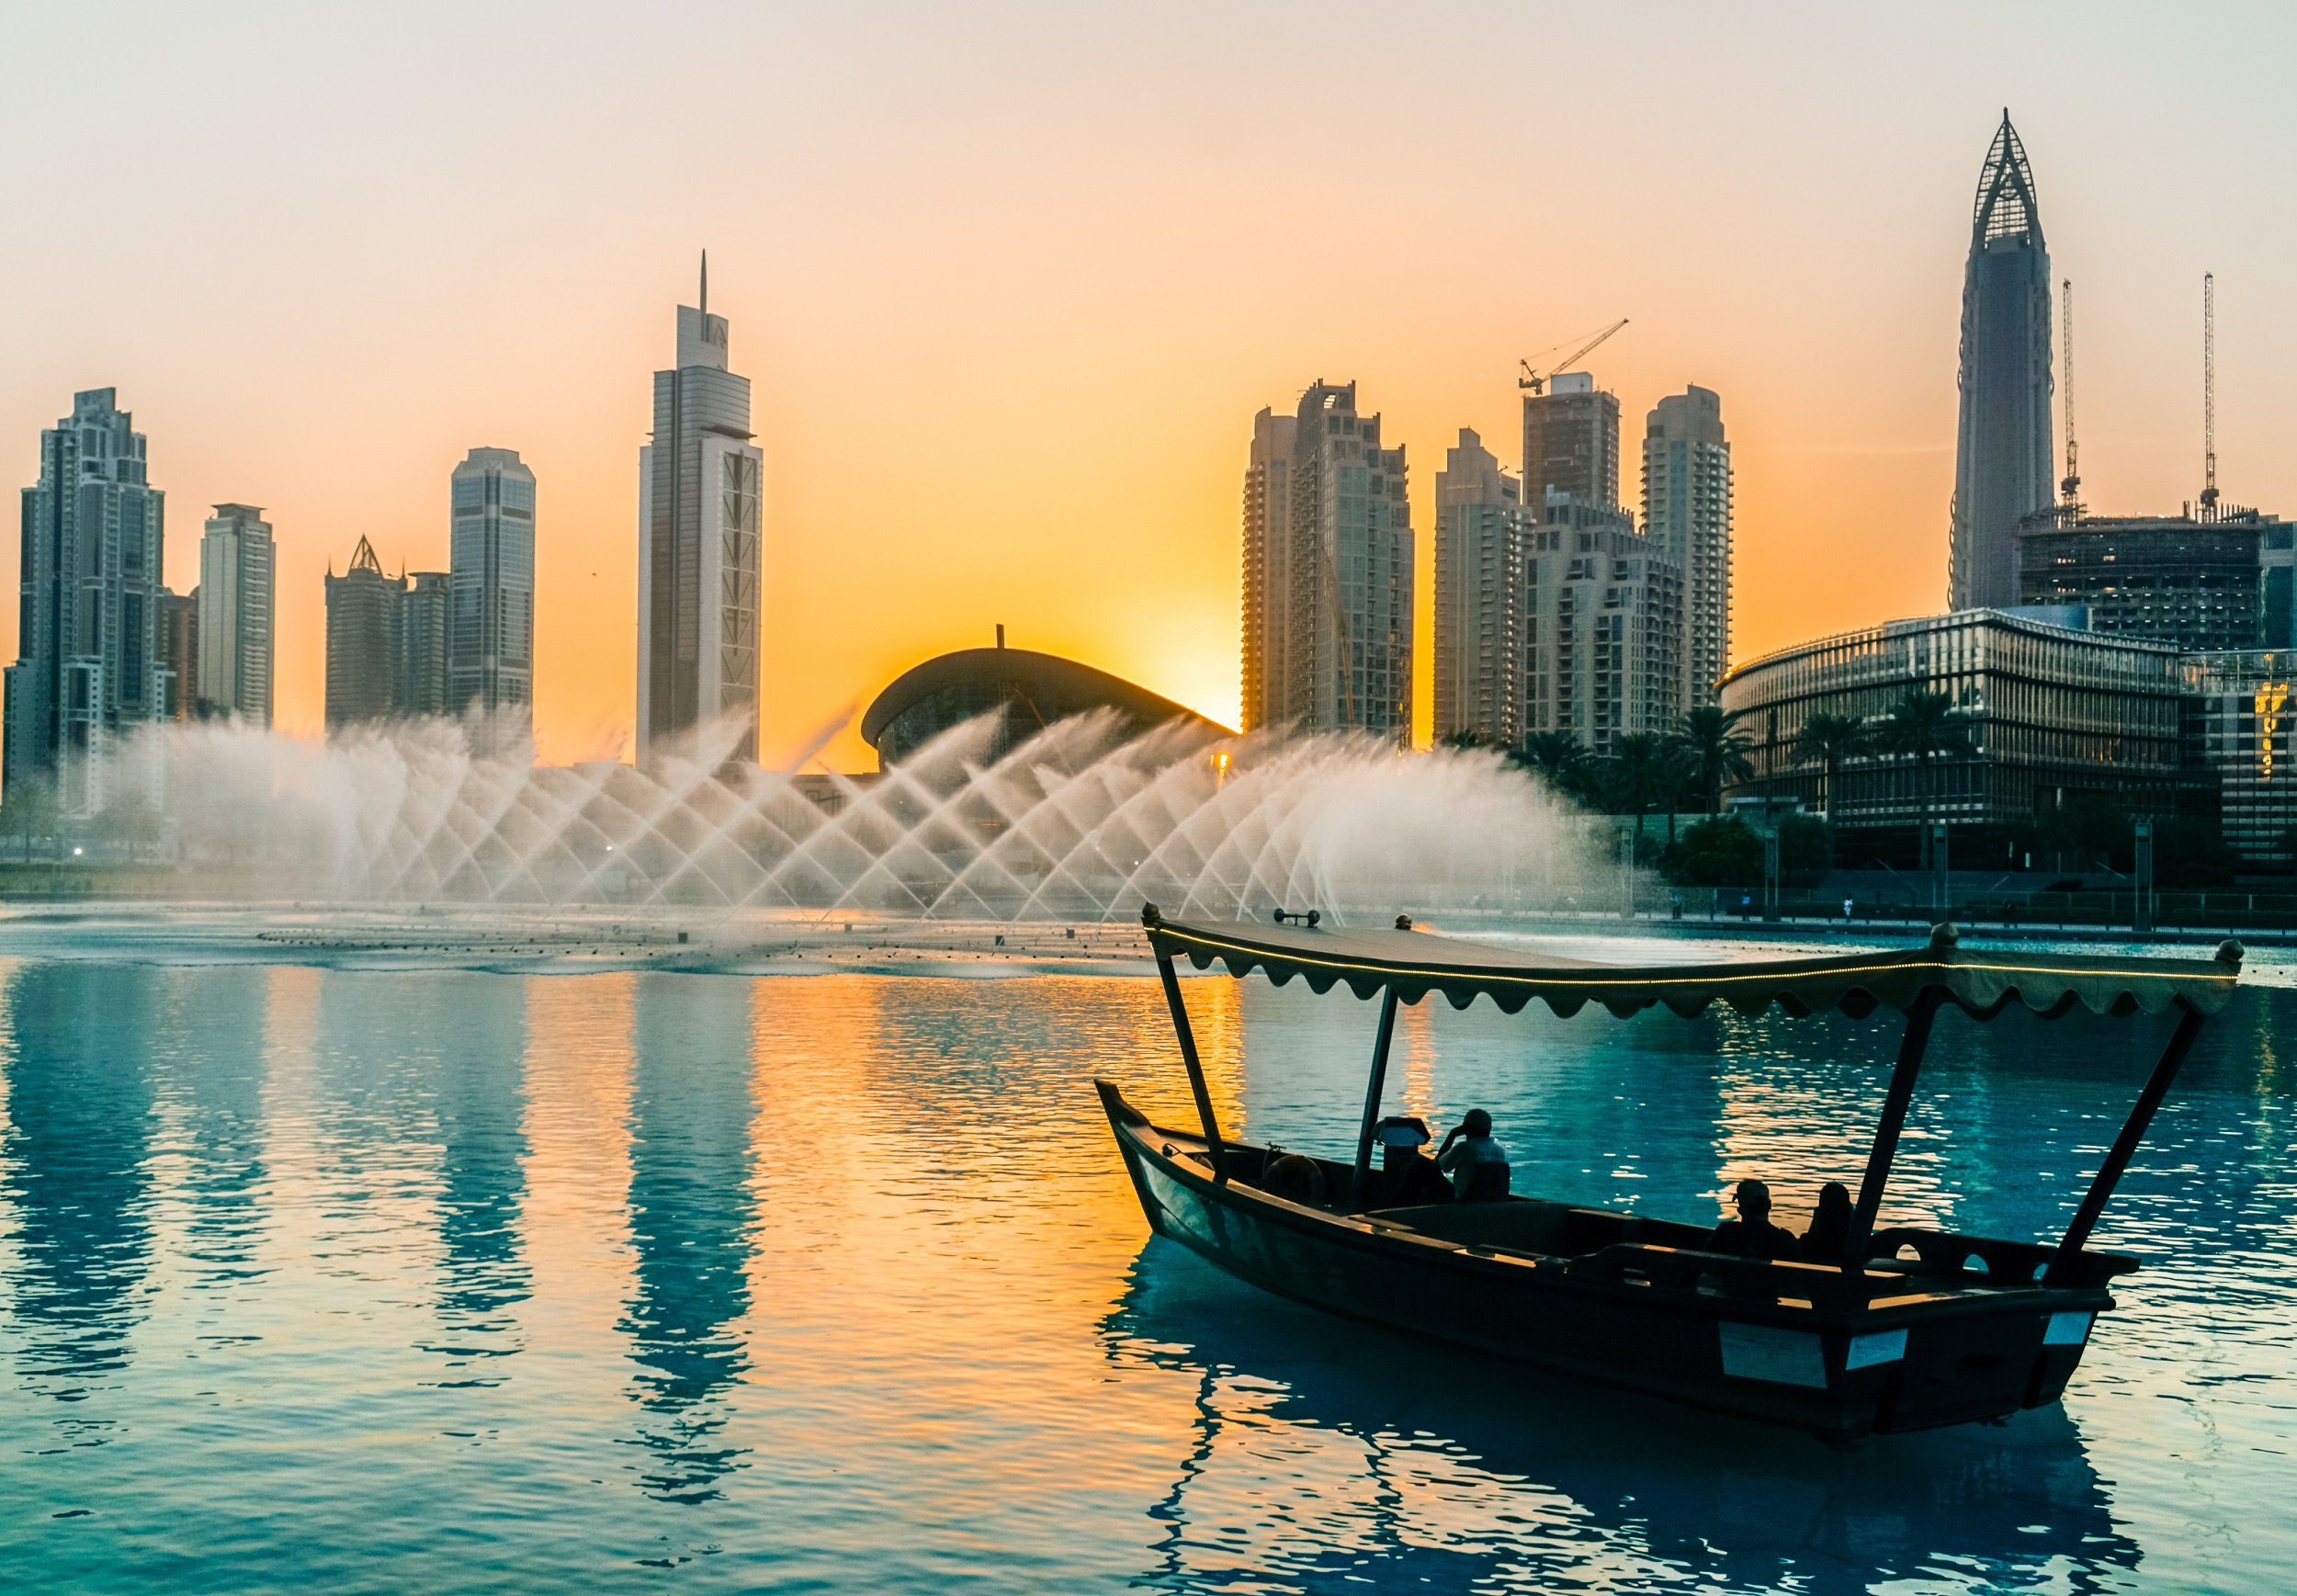 Marina Dhow Cruise Dinner From Dubai4